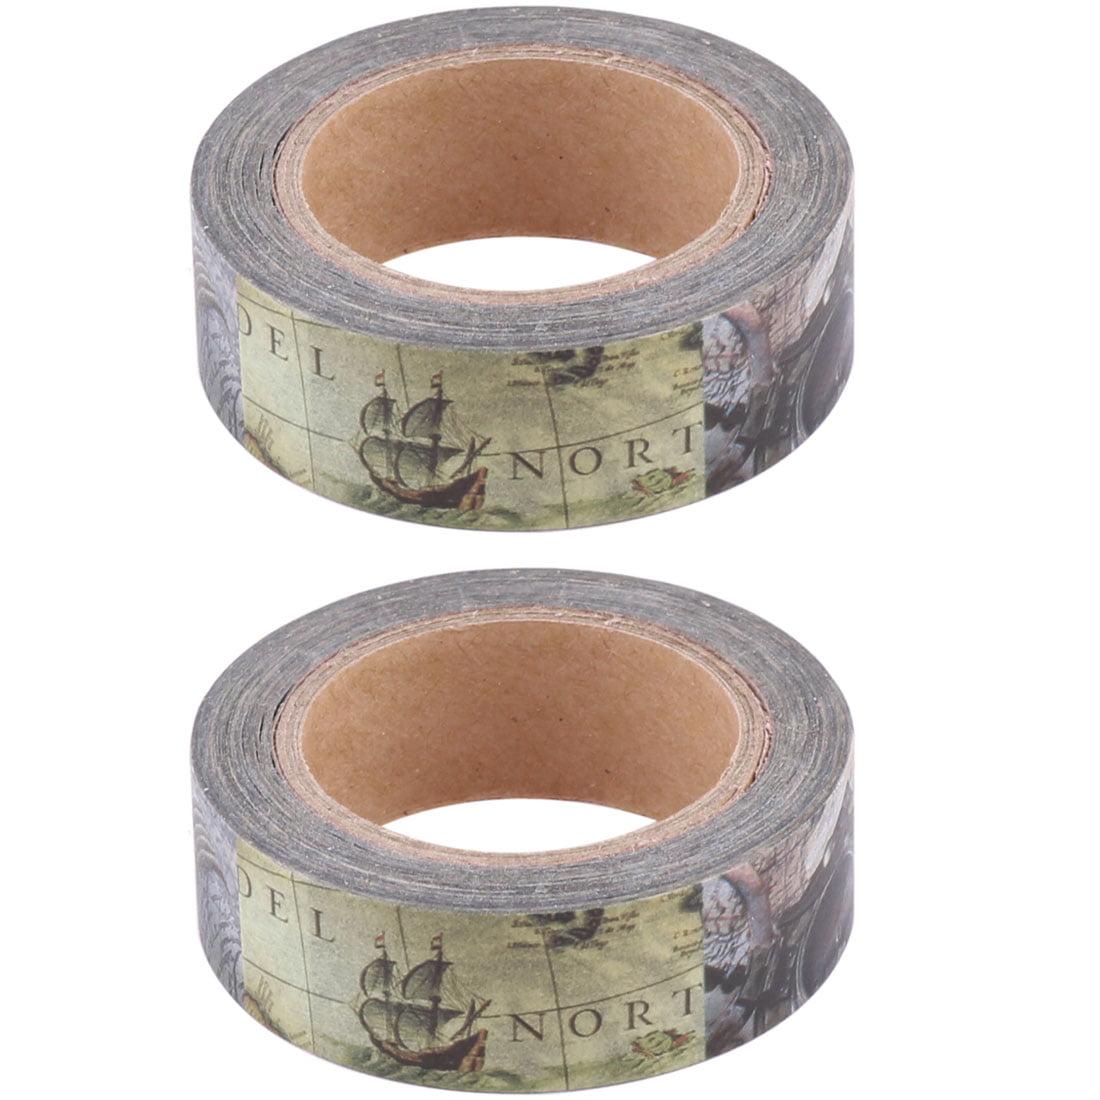 Washi Paper Compass Print Craft Book Box Decorative Tape Roll 10M Length 2pcs